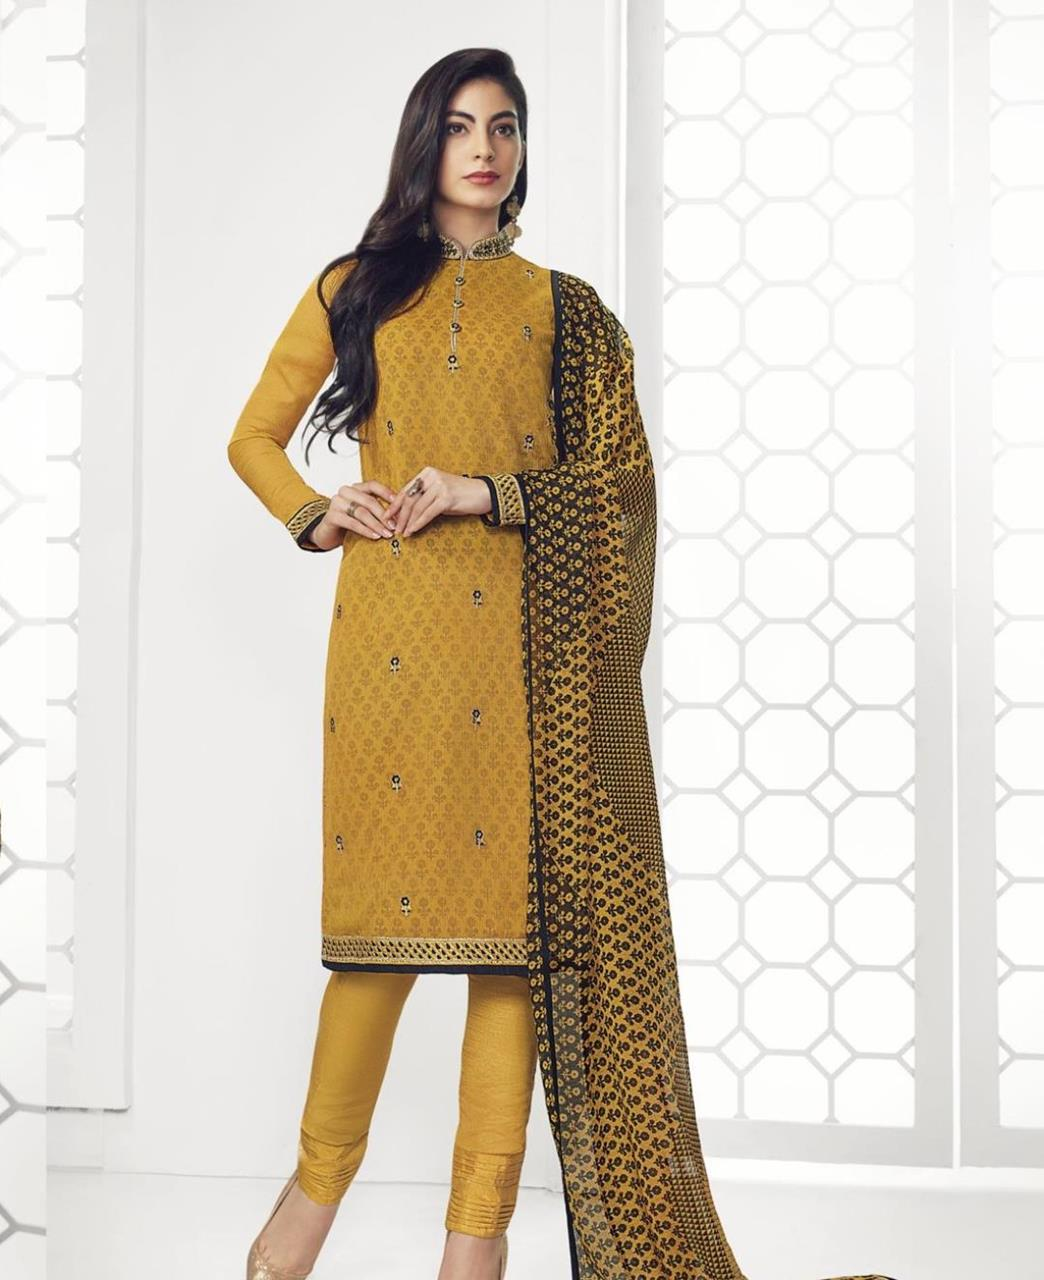 Stone Work Georgette Straight cut Salwar Kameez in Musturd Yellow